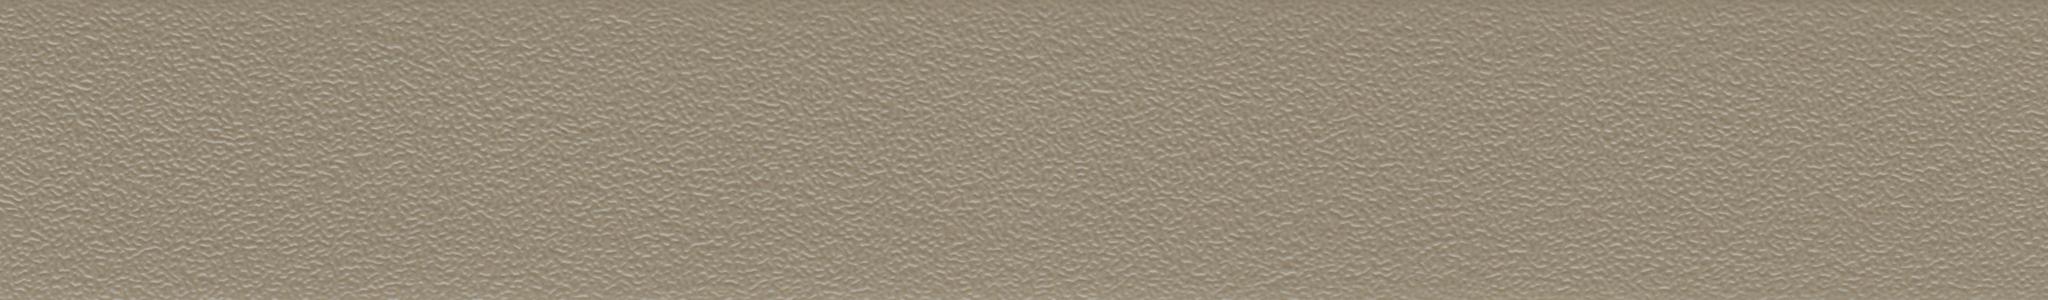 HU 182512 ABS Edge Brown Pearl 101